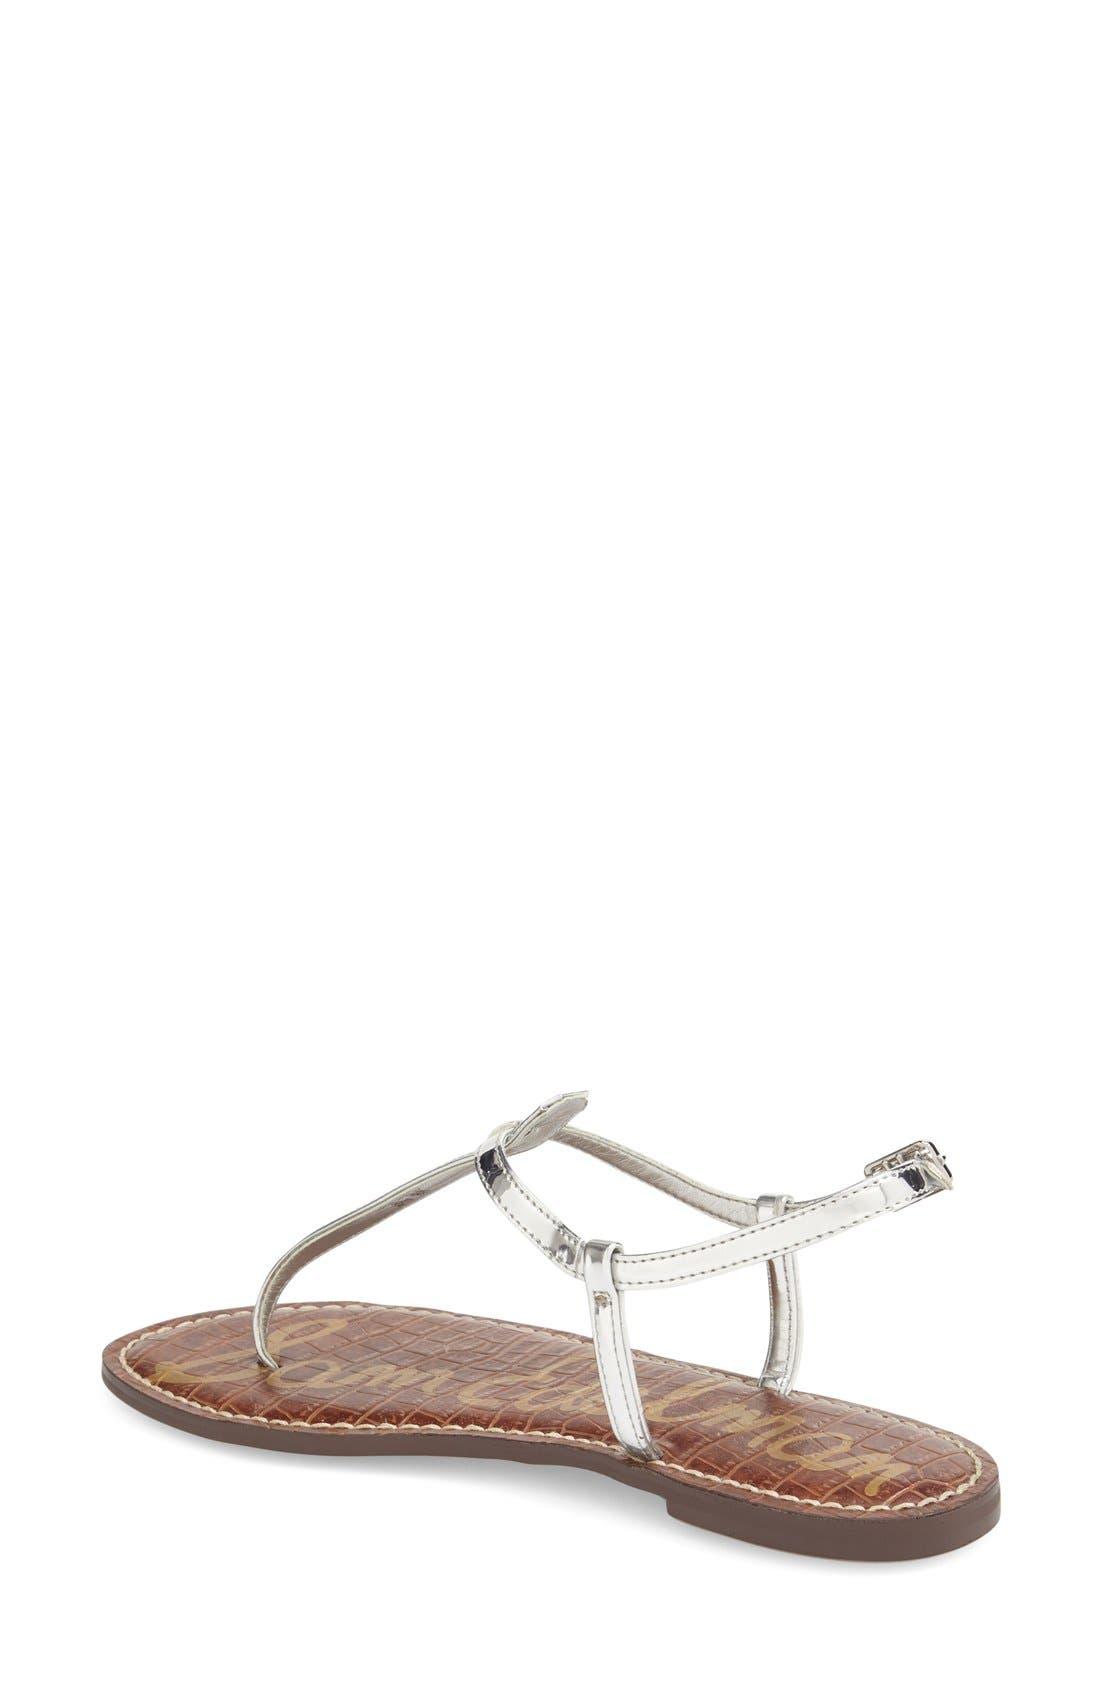 Leopard Print Shoes Nordstrom Austin Flats Laken Beige 37